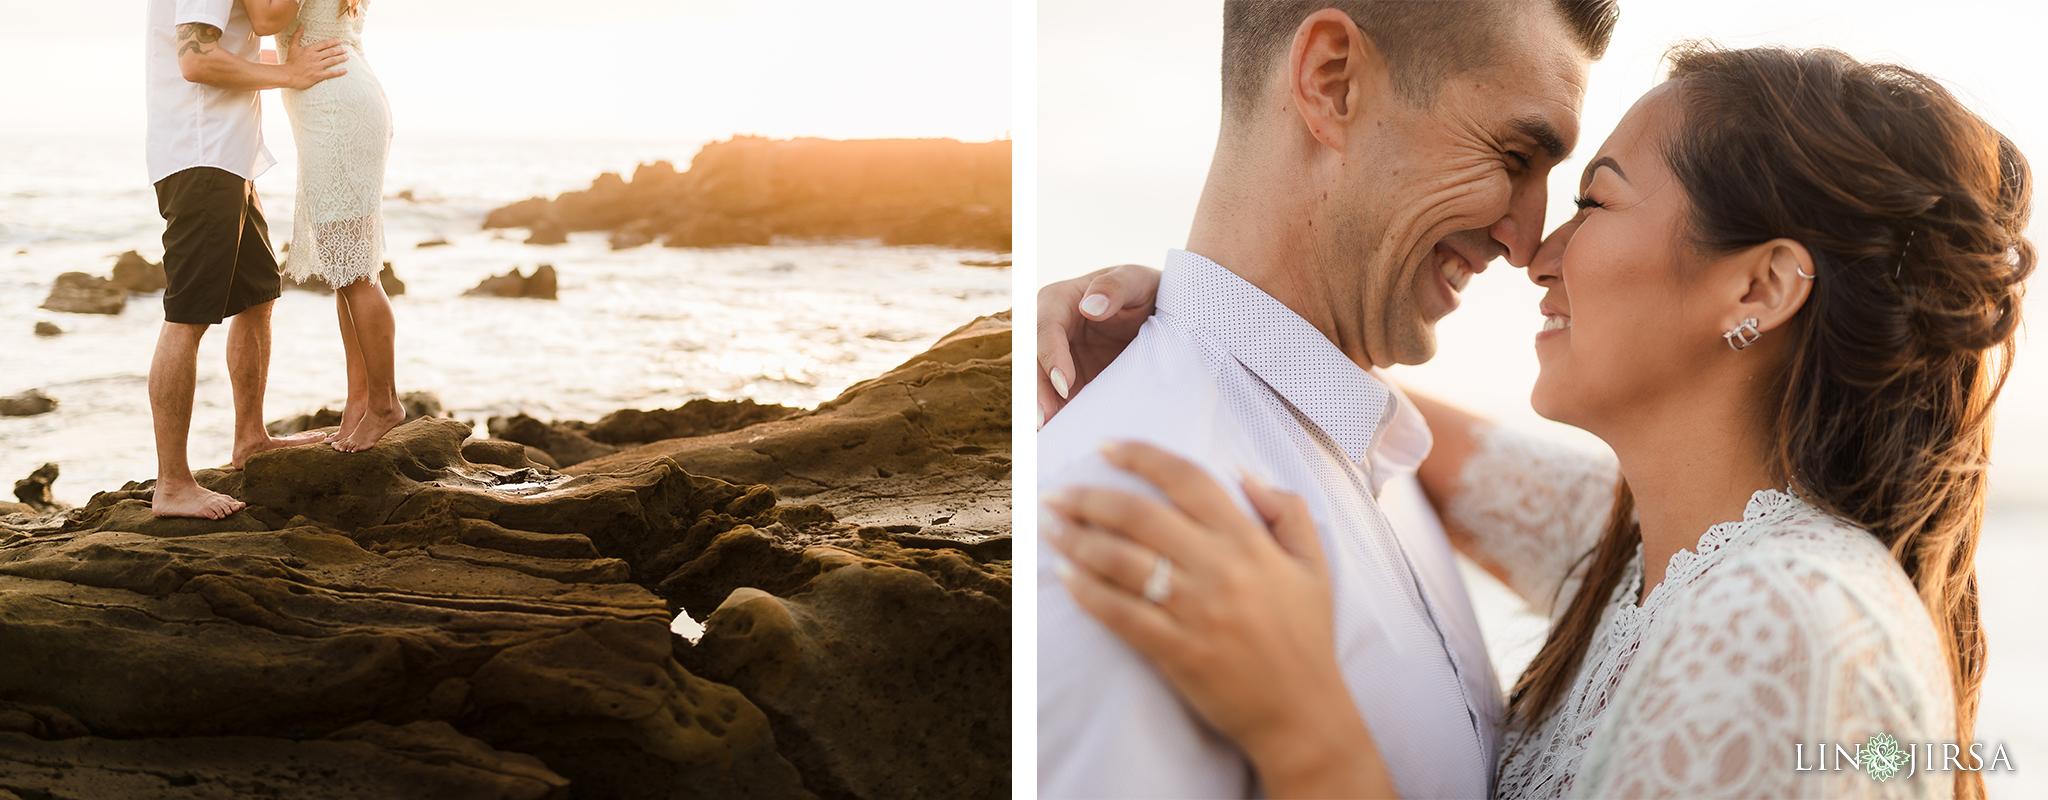 18 Heisler Beach Orange County Engagement Photography